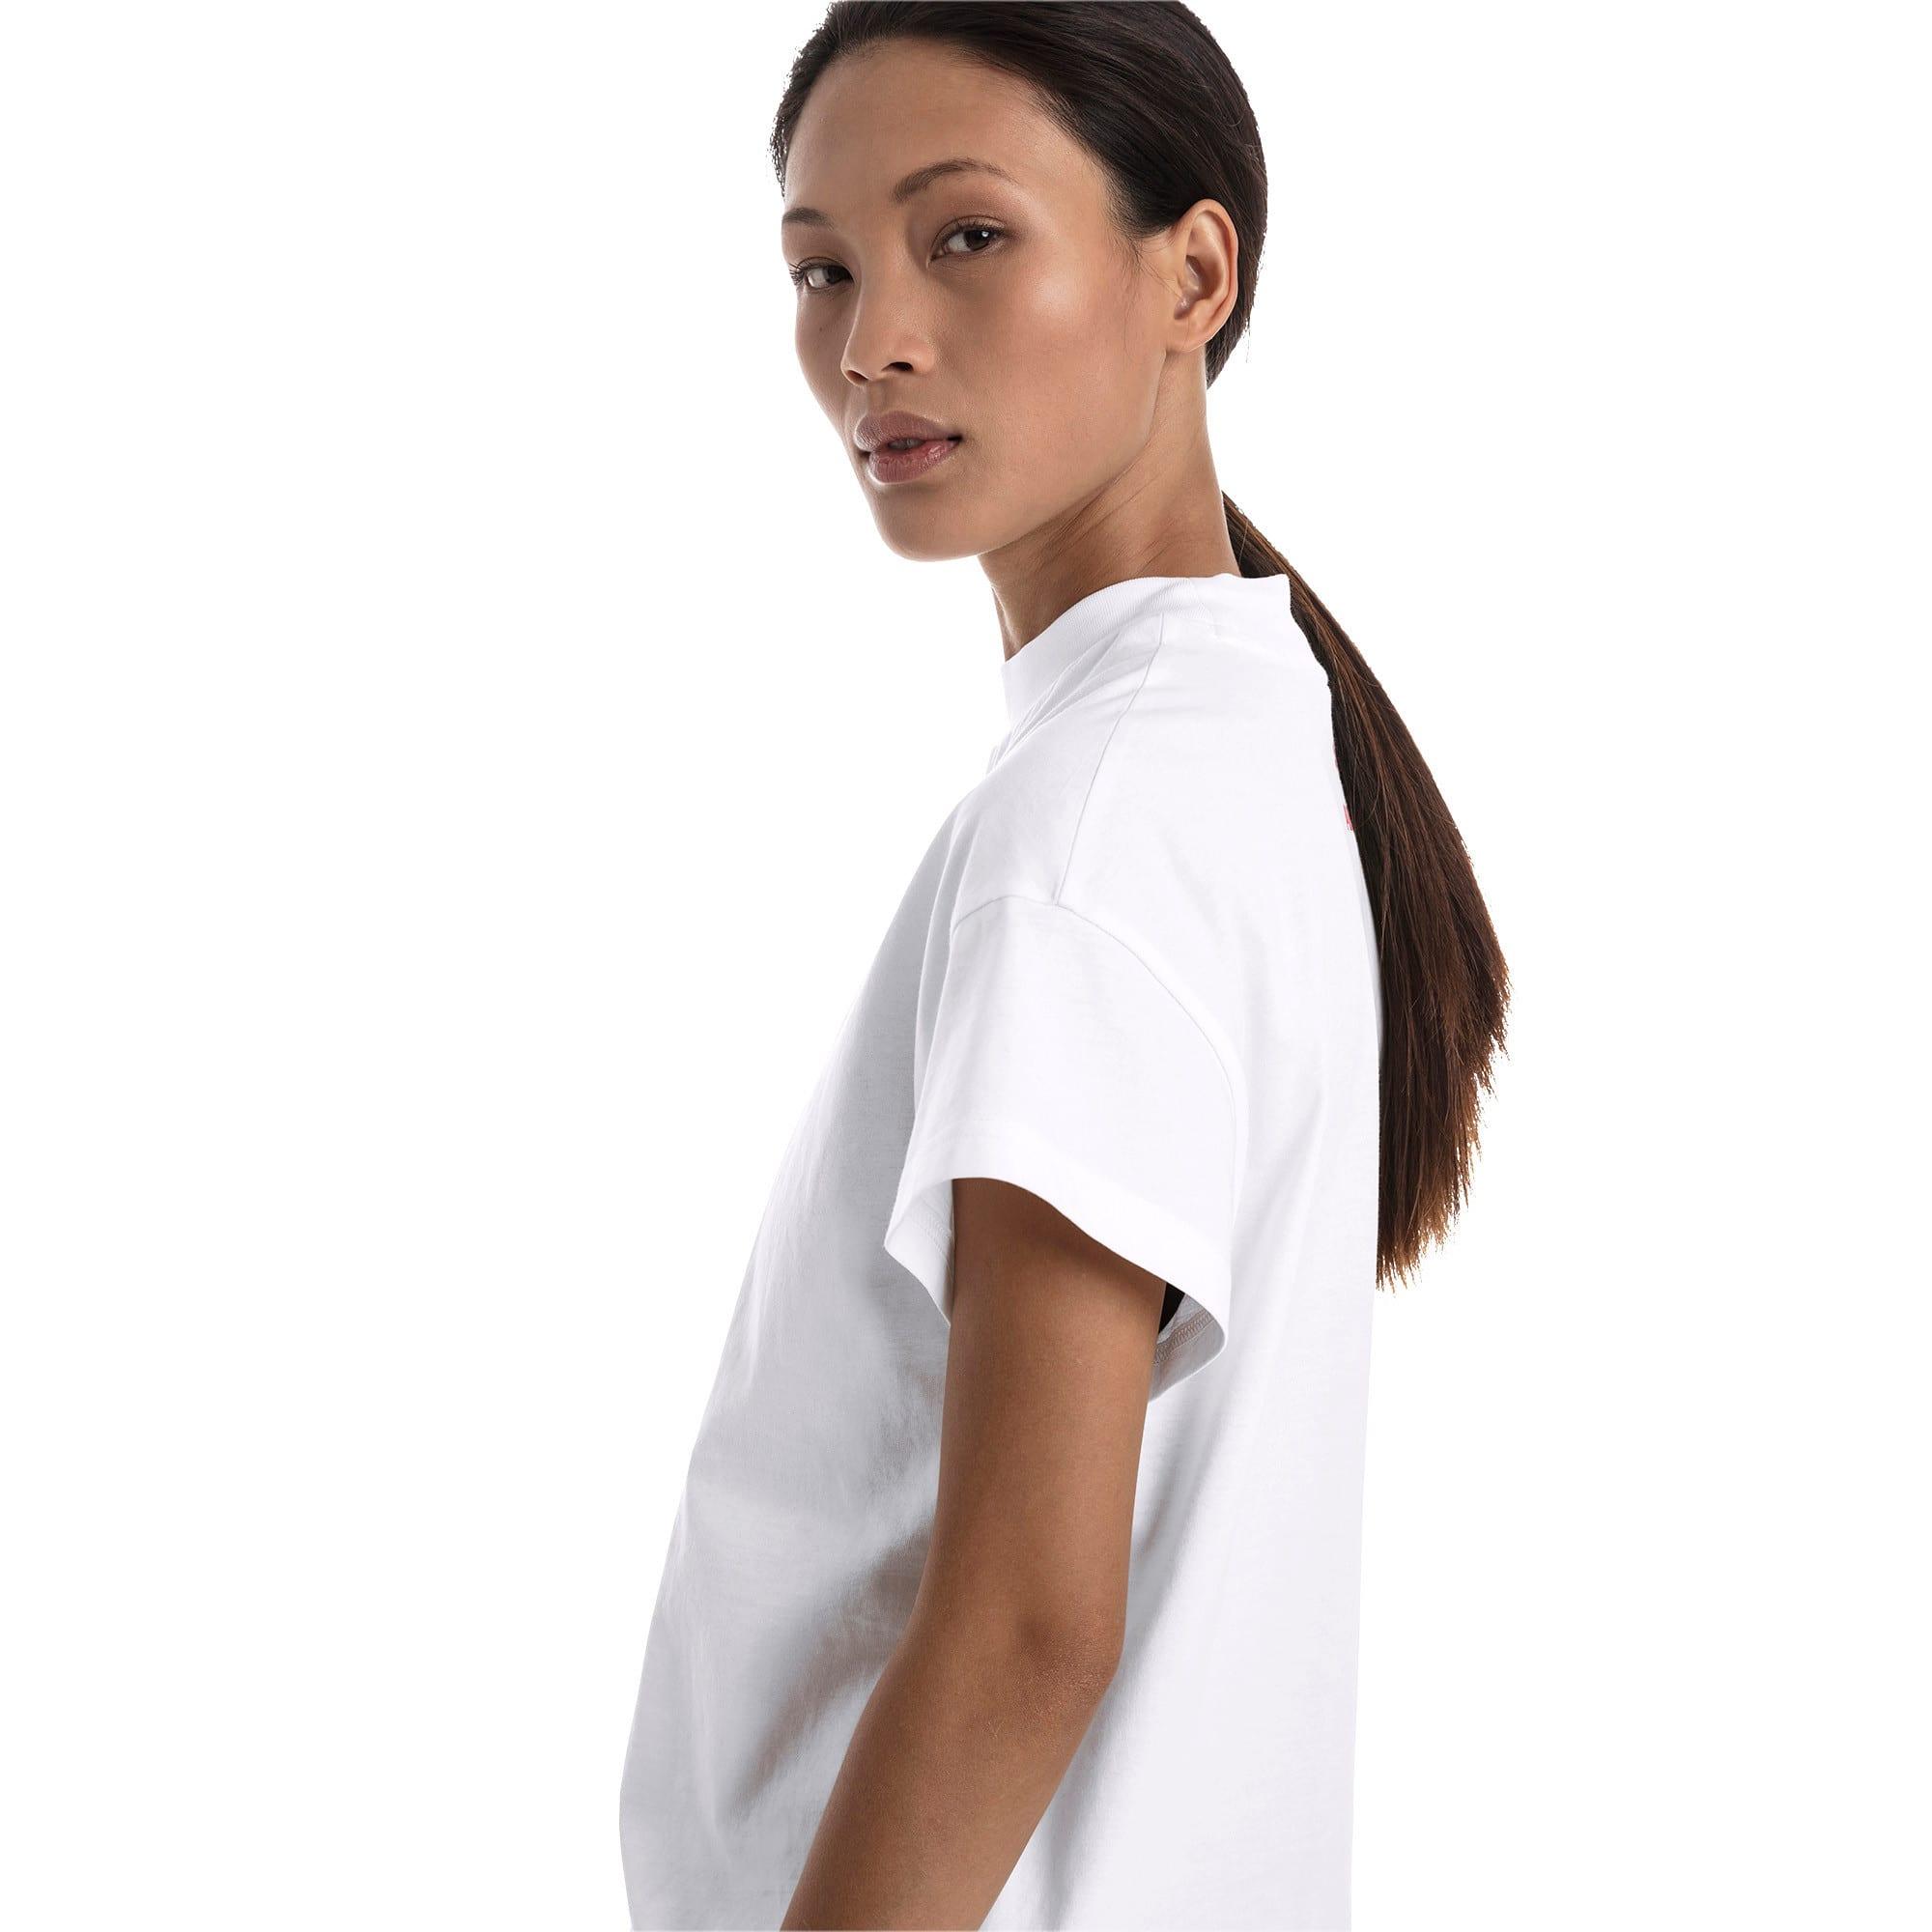 Thumbnail 3 of PUMA XTG グラフィック ウィメンズ SS Tシャツ 半袖, Puma White, medium-JPN